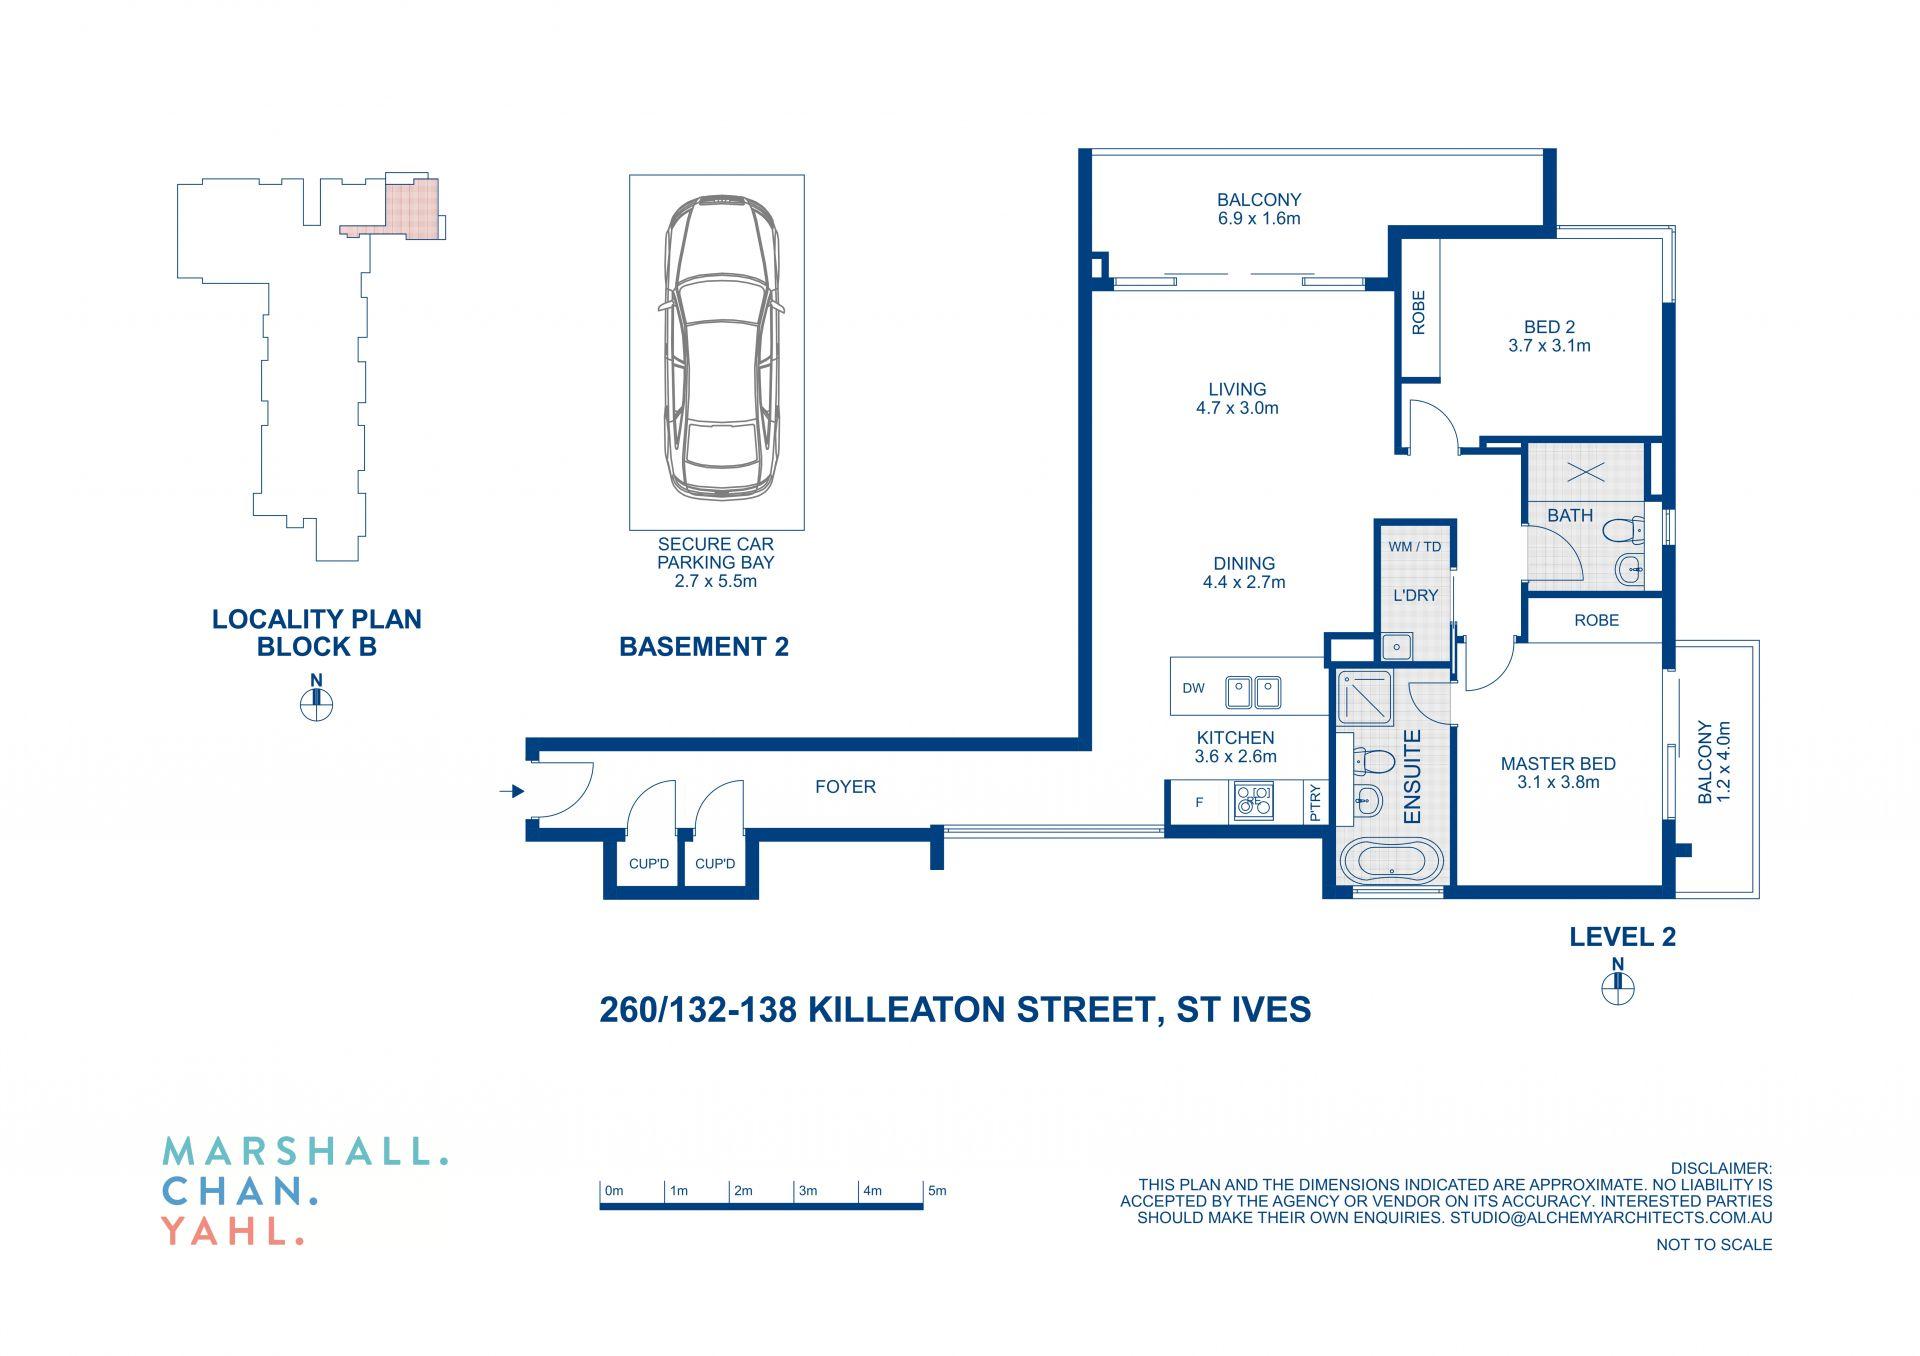 B260/132-138 Killeaton Street St Ives 2075